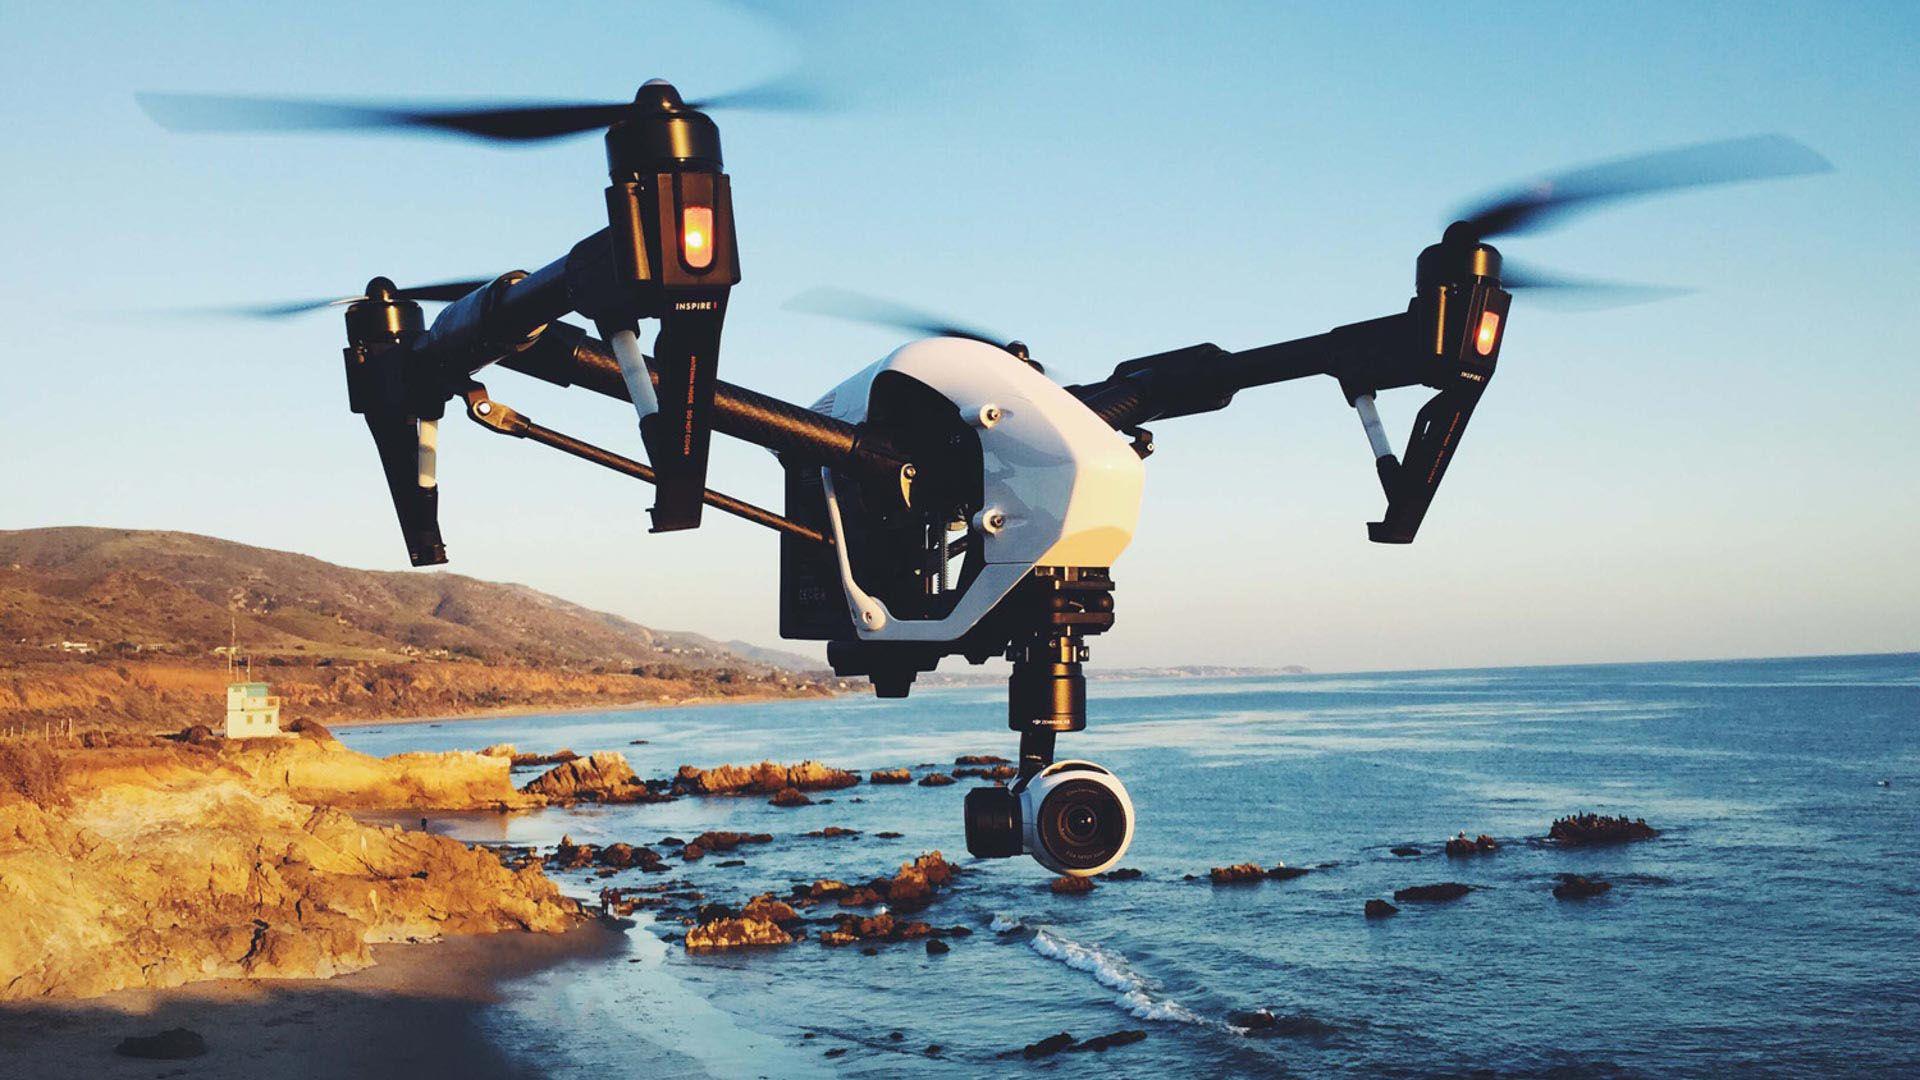 Drone hd wallpaper 1080